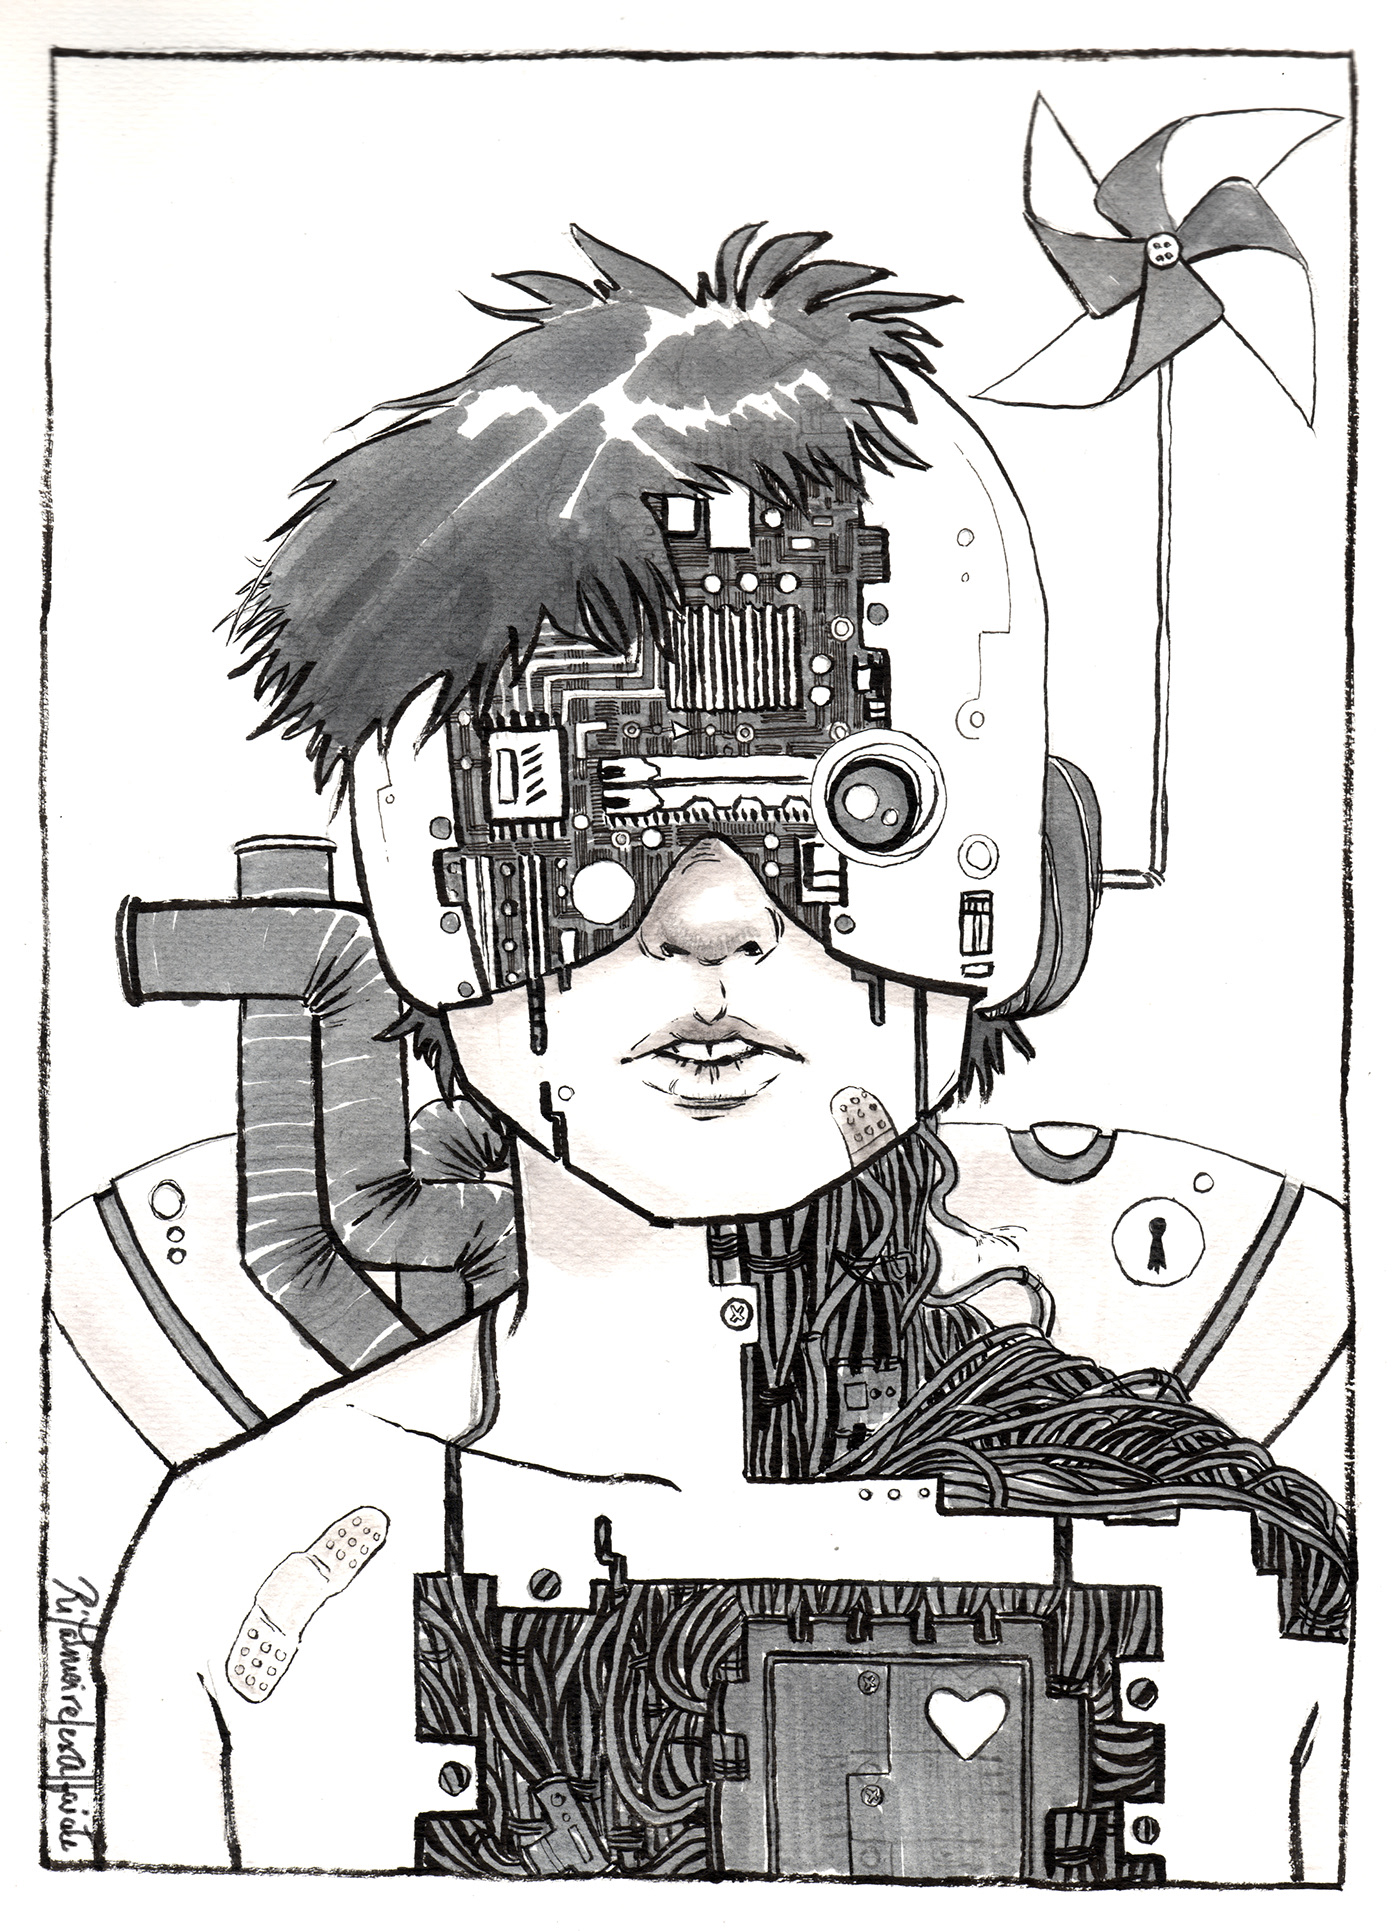 ink futuristic Cyborg monsters